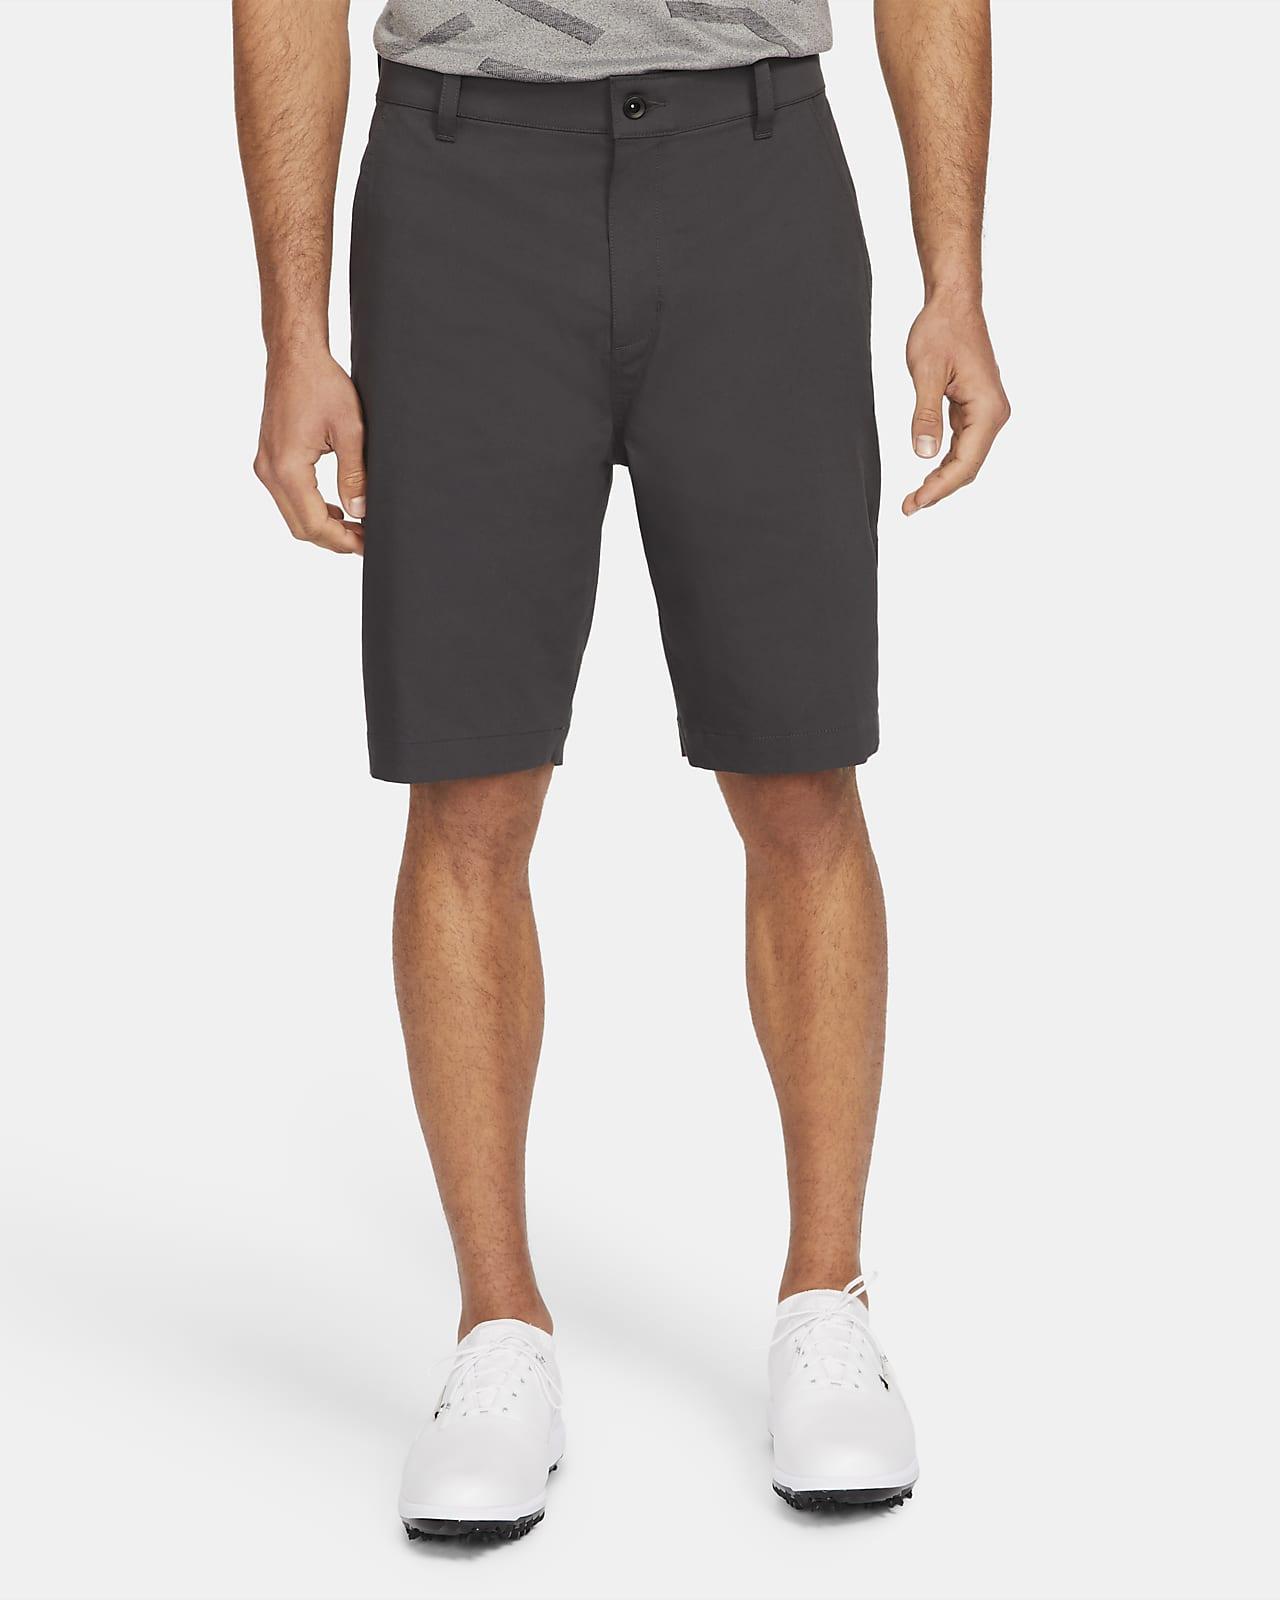 Nike Dri-FIT UV Men's 27cm (approx.) Golf Chino Shorts